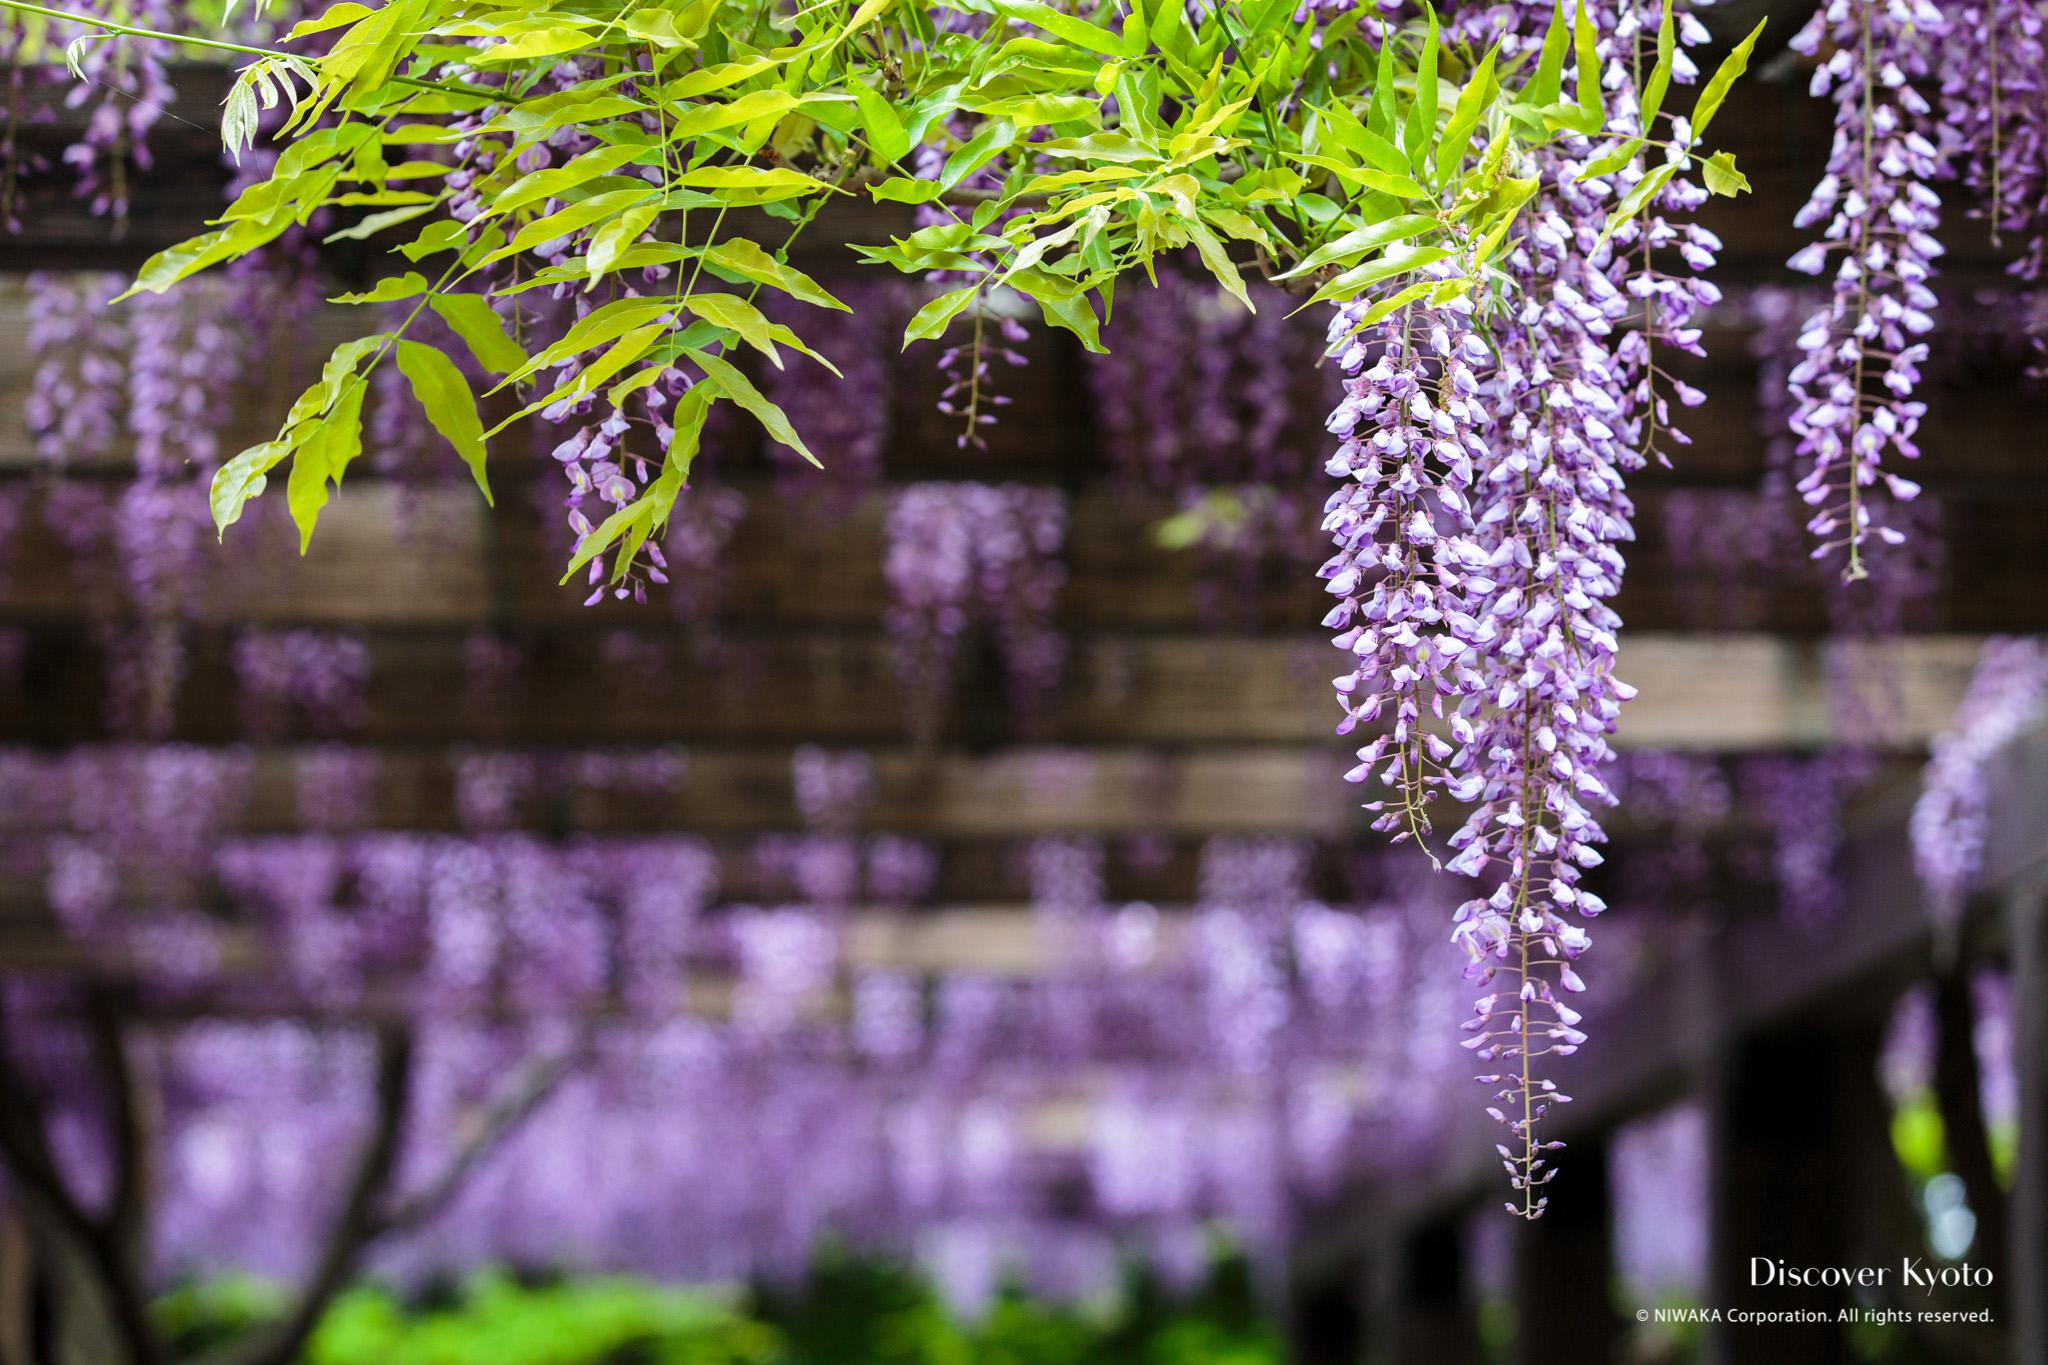 Wisteria Discover Kyoto